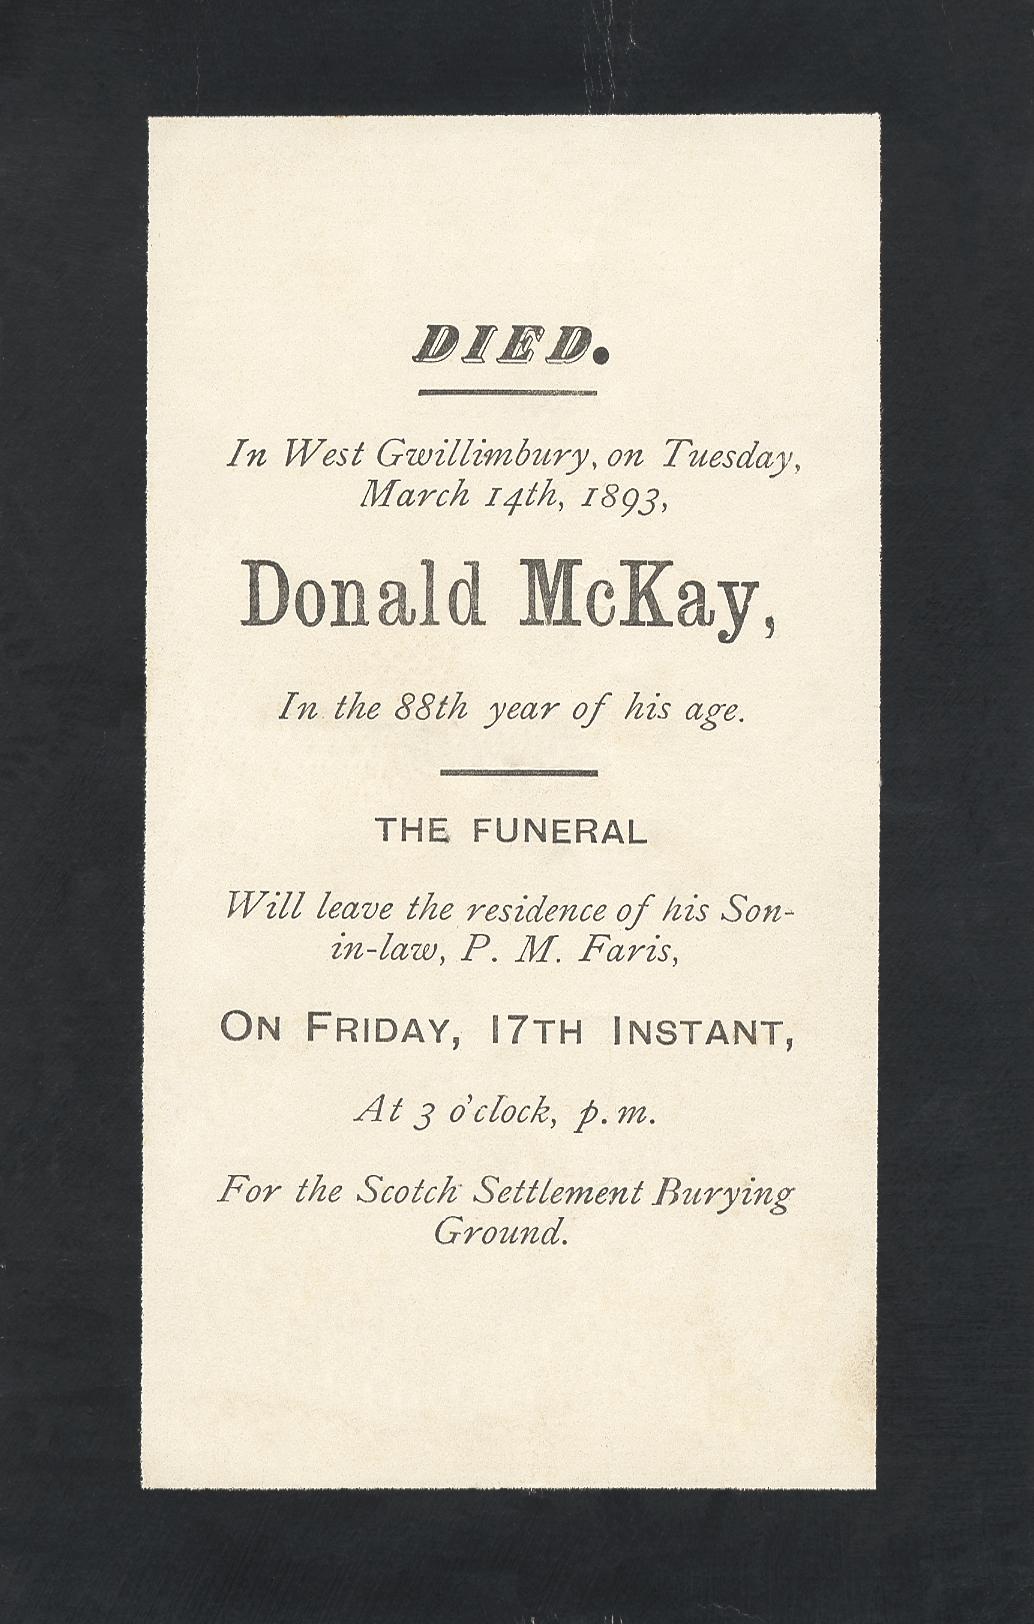 Donald McKay